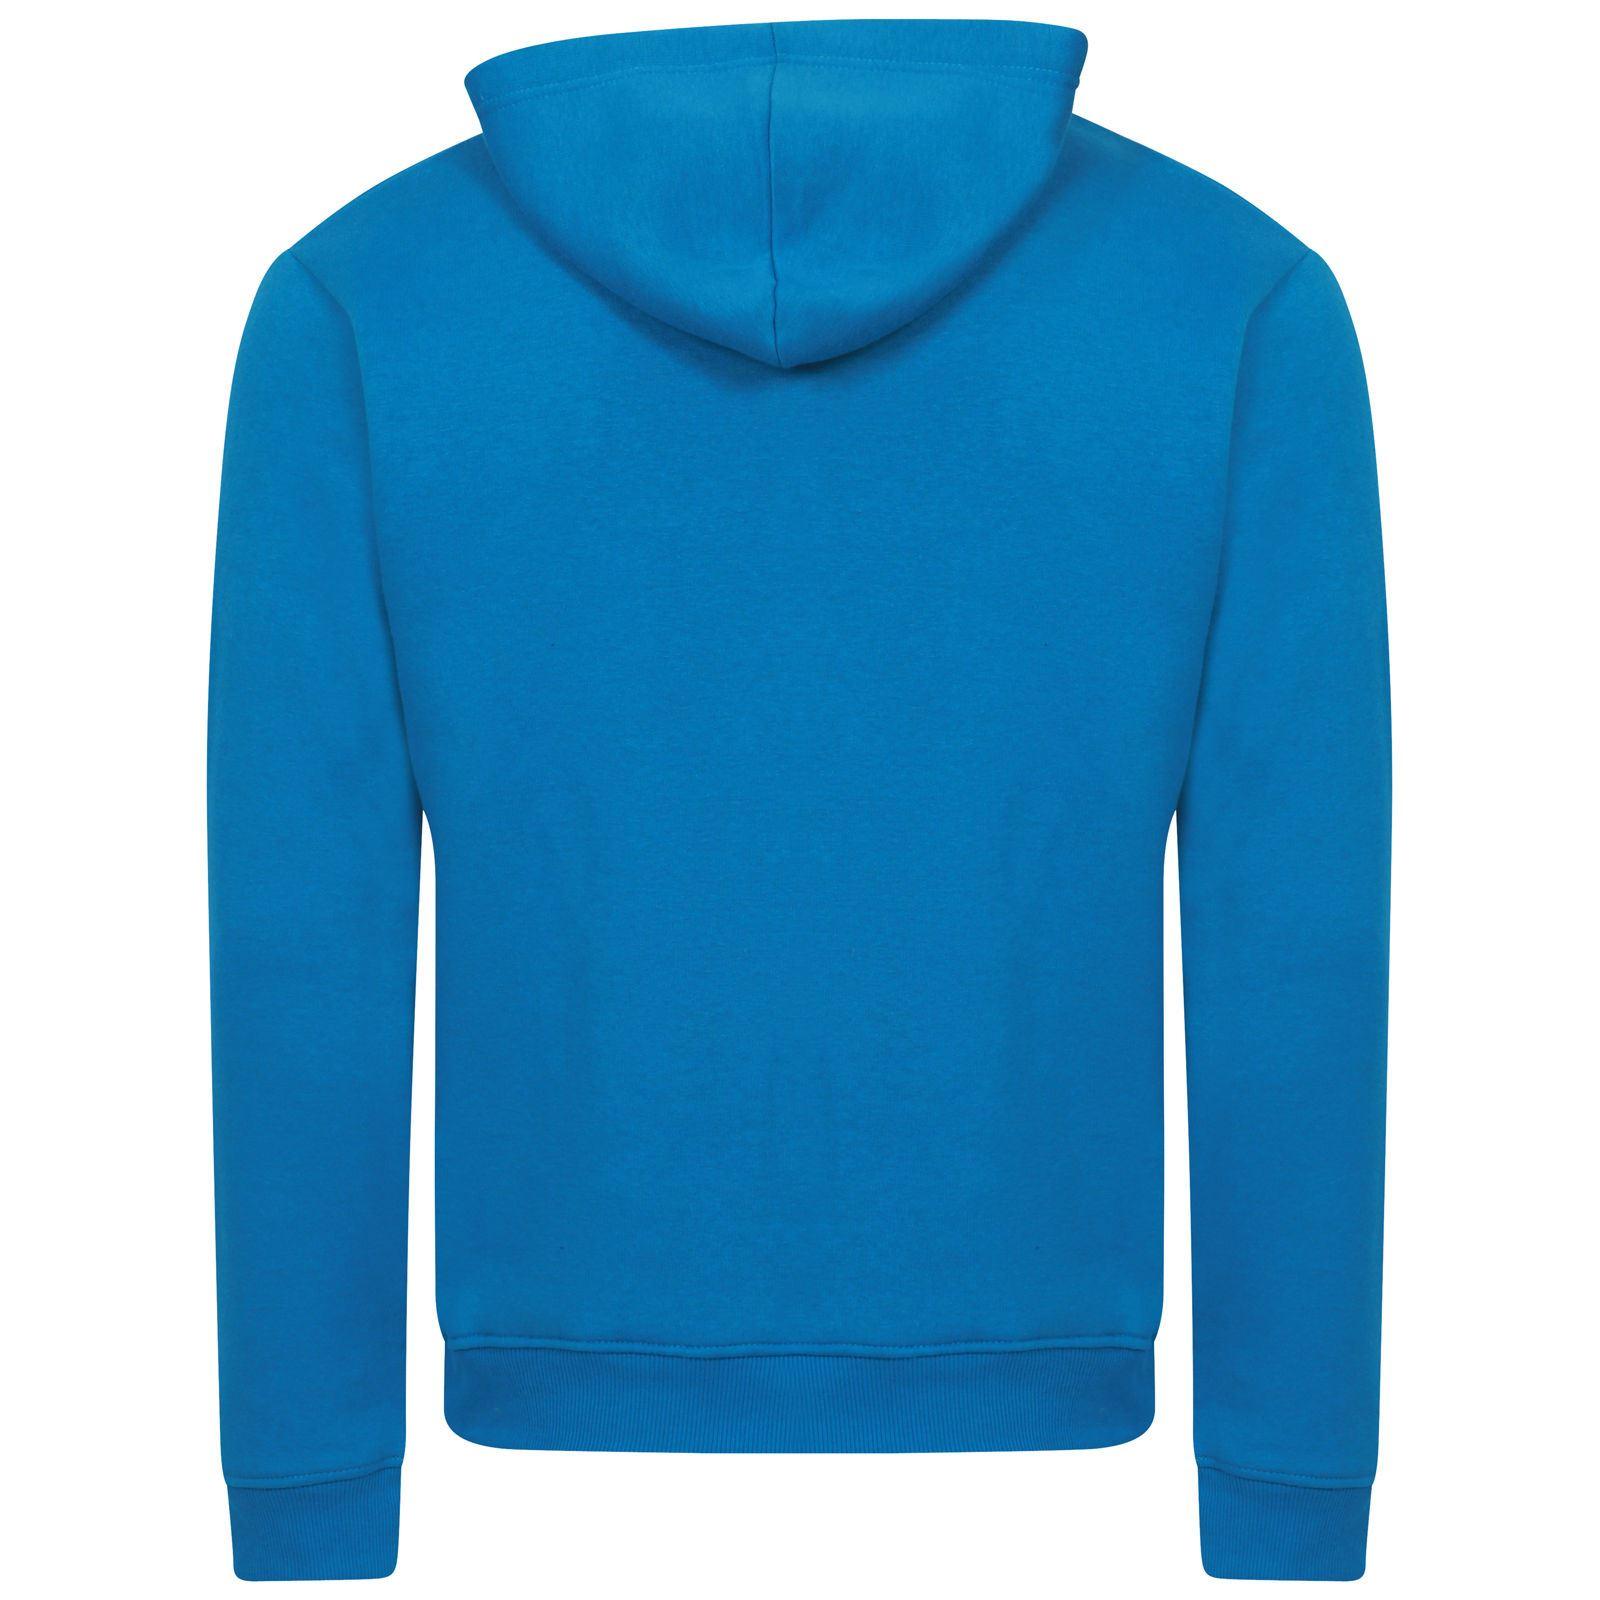 Plain pullover hoodies